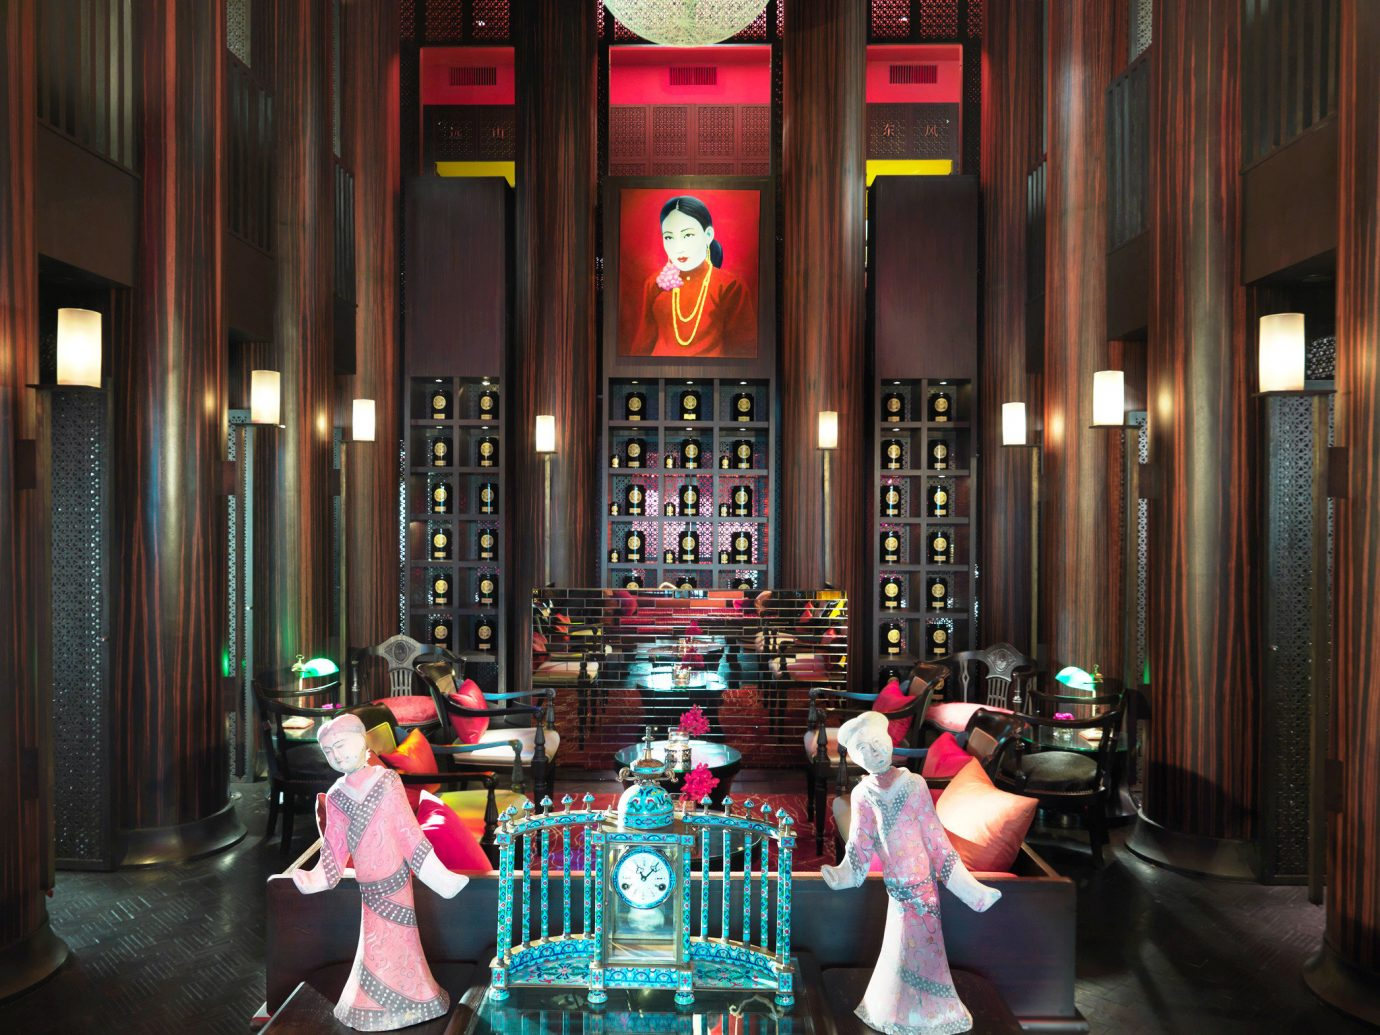 City Cultural Elegant Hotels Lobby Lounge floor Bar lighting restaurant interior design night